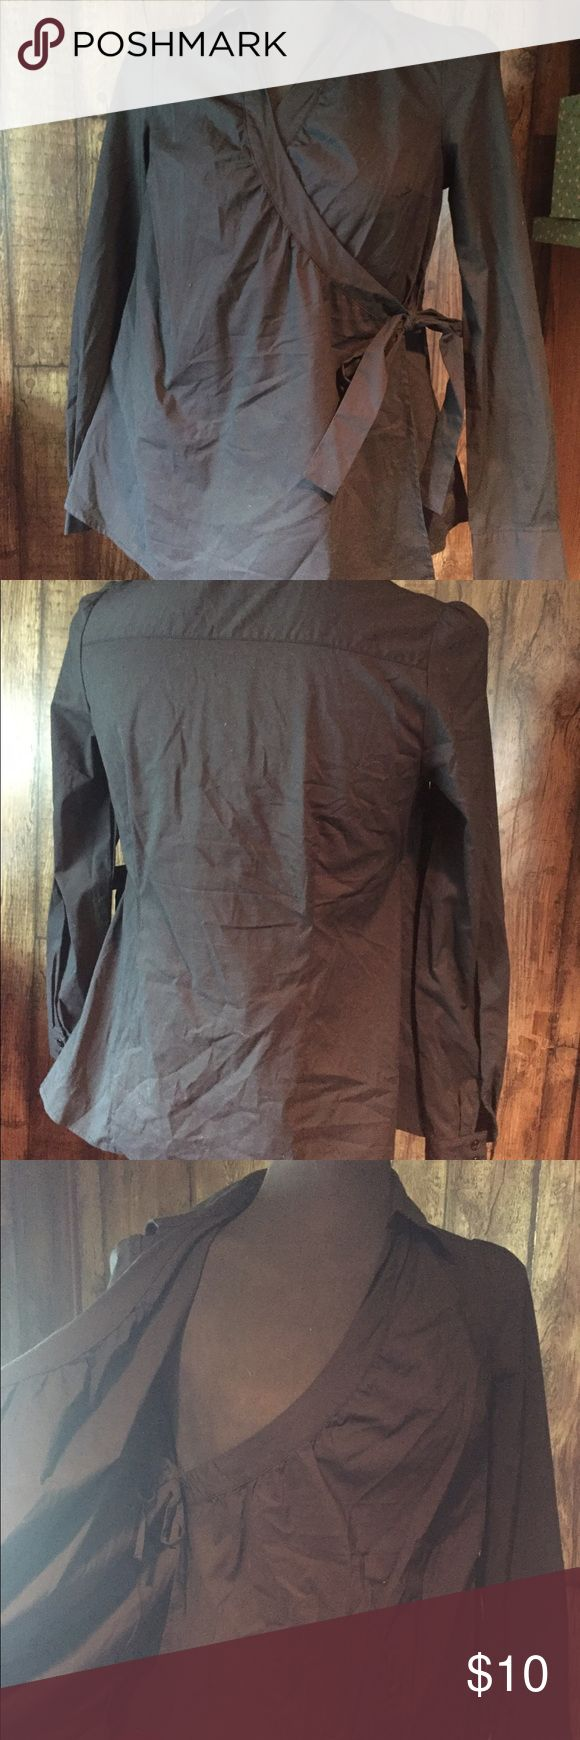 Black maternity shirt from old navy Black maternity shirt from old navy Old Navy Tops